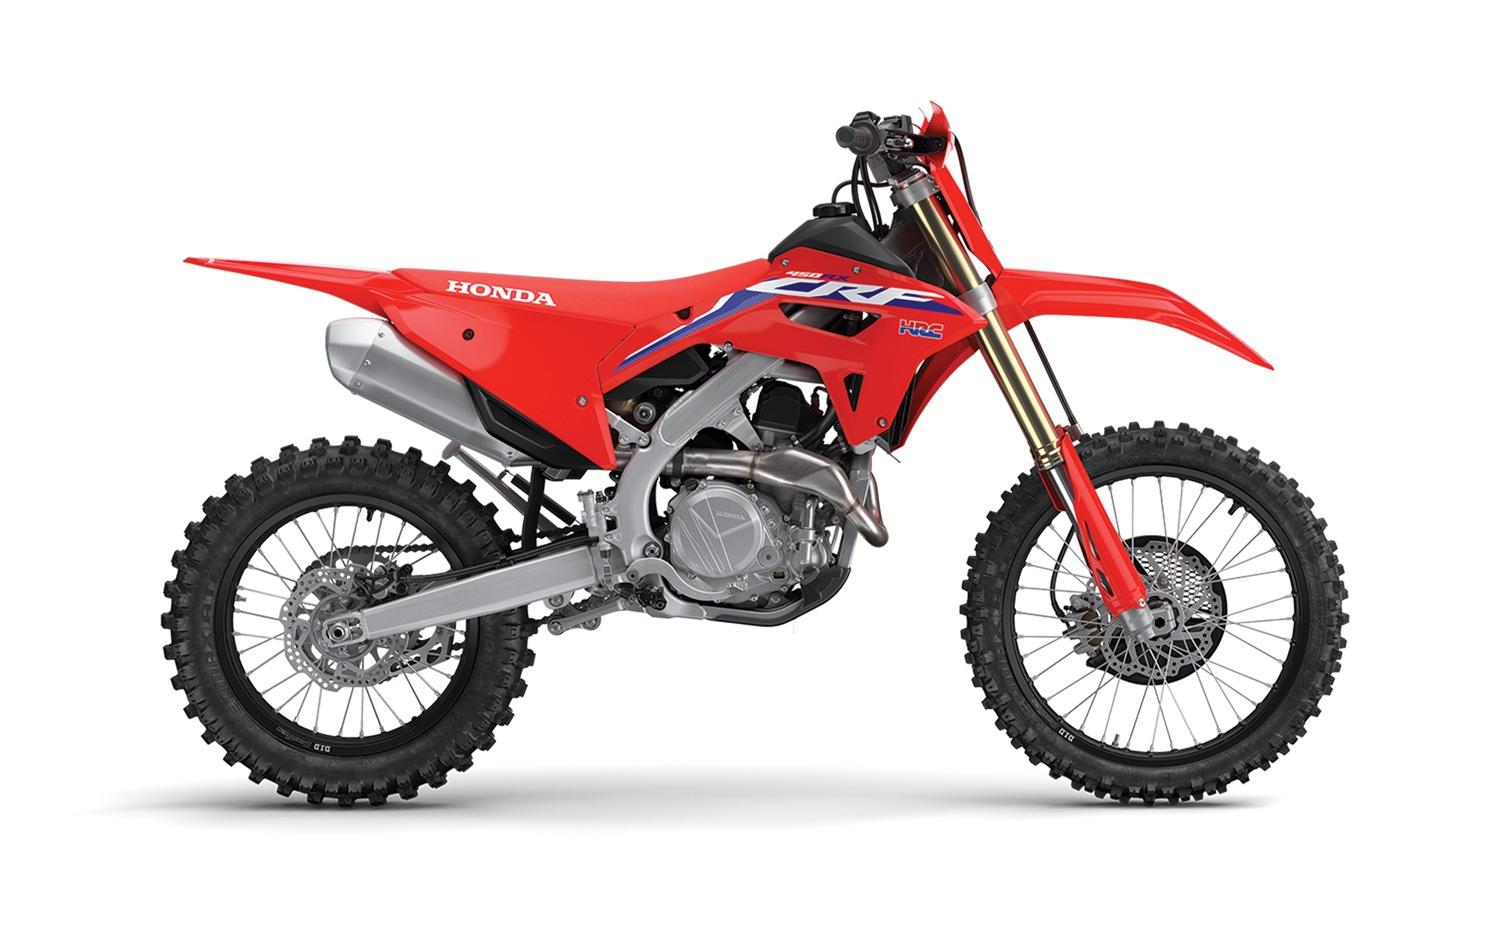 2022 Honda CRF450RX Frais inclus+Taxes